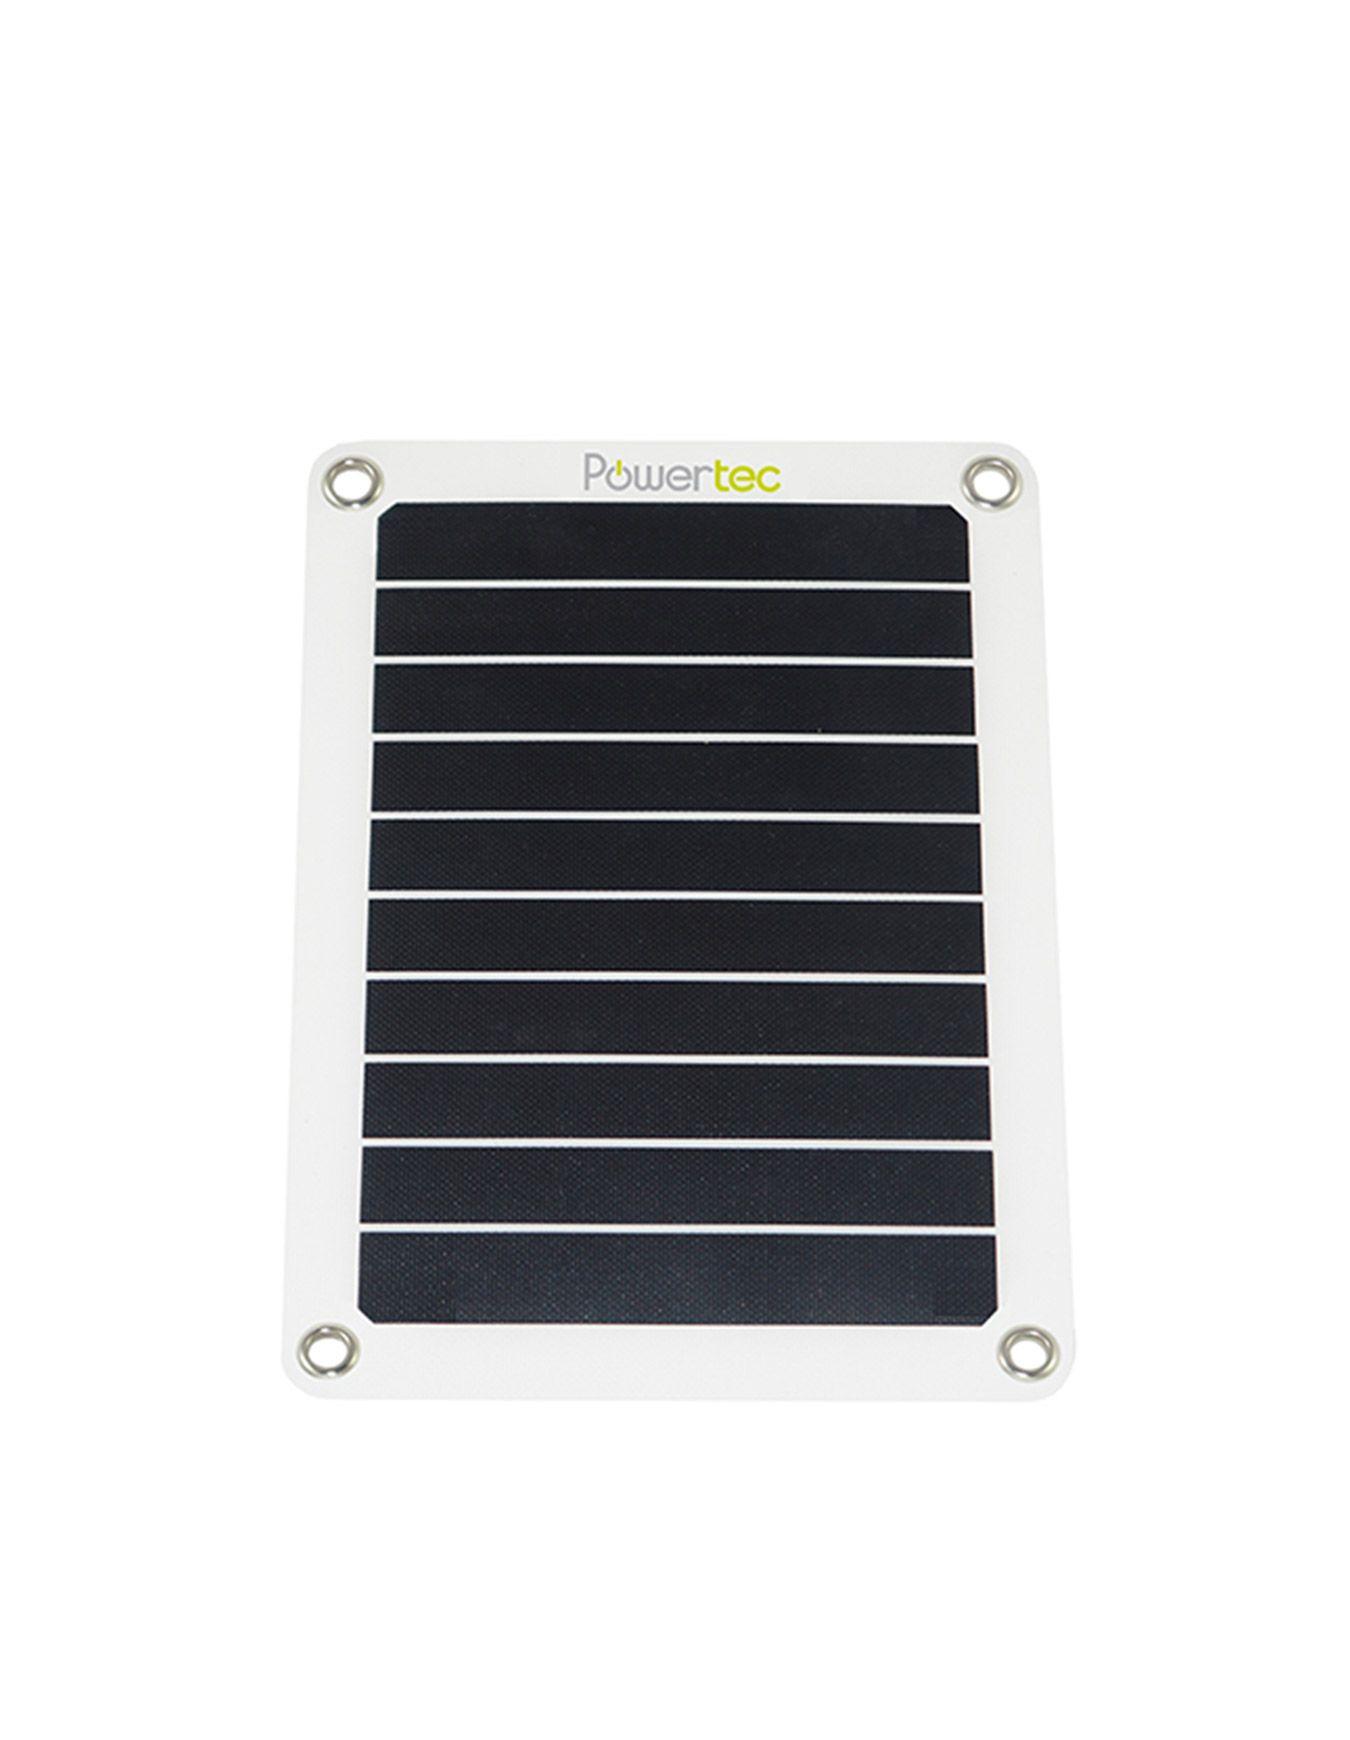 powertec panneau solaire sunflex ul 800ma solar chargers snowleader. Black Bedroom Furniture Sets. Home Design Ideas